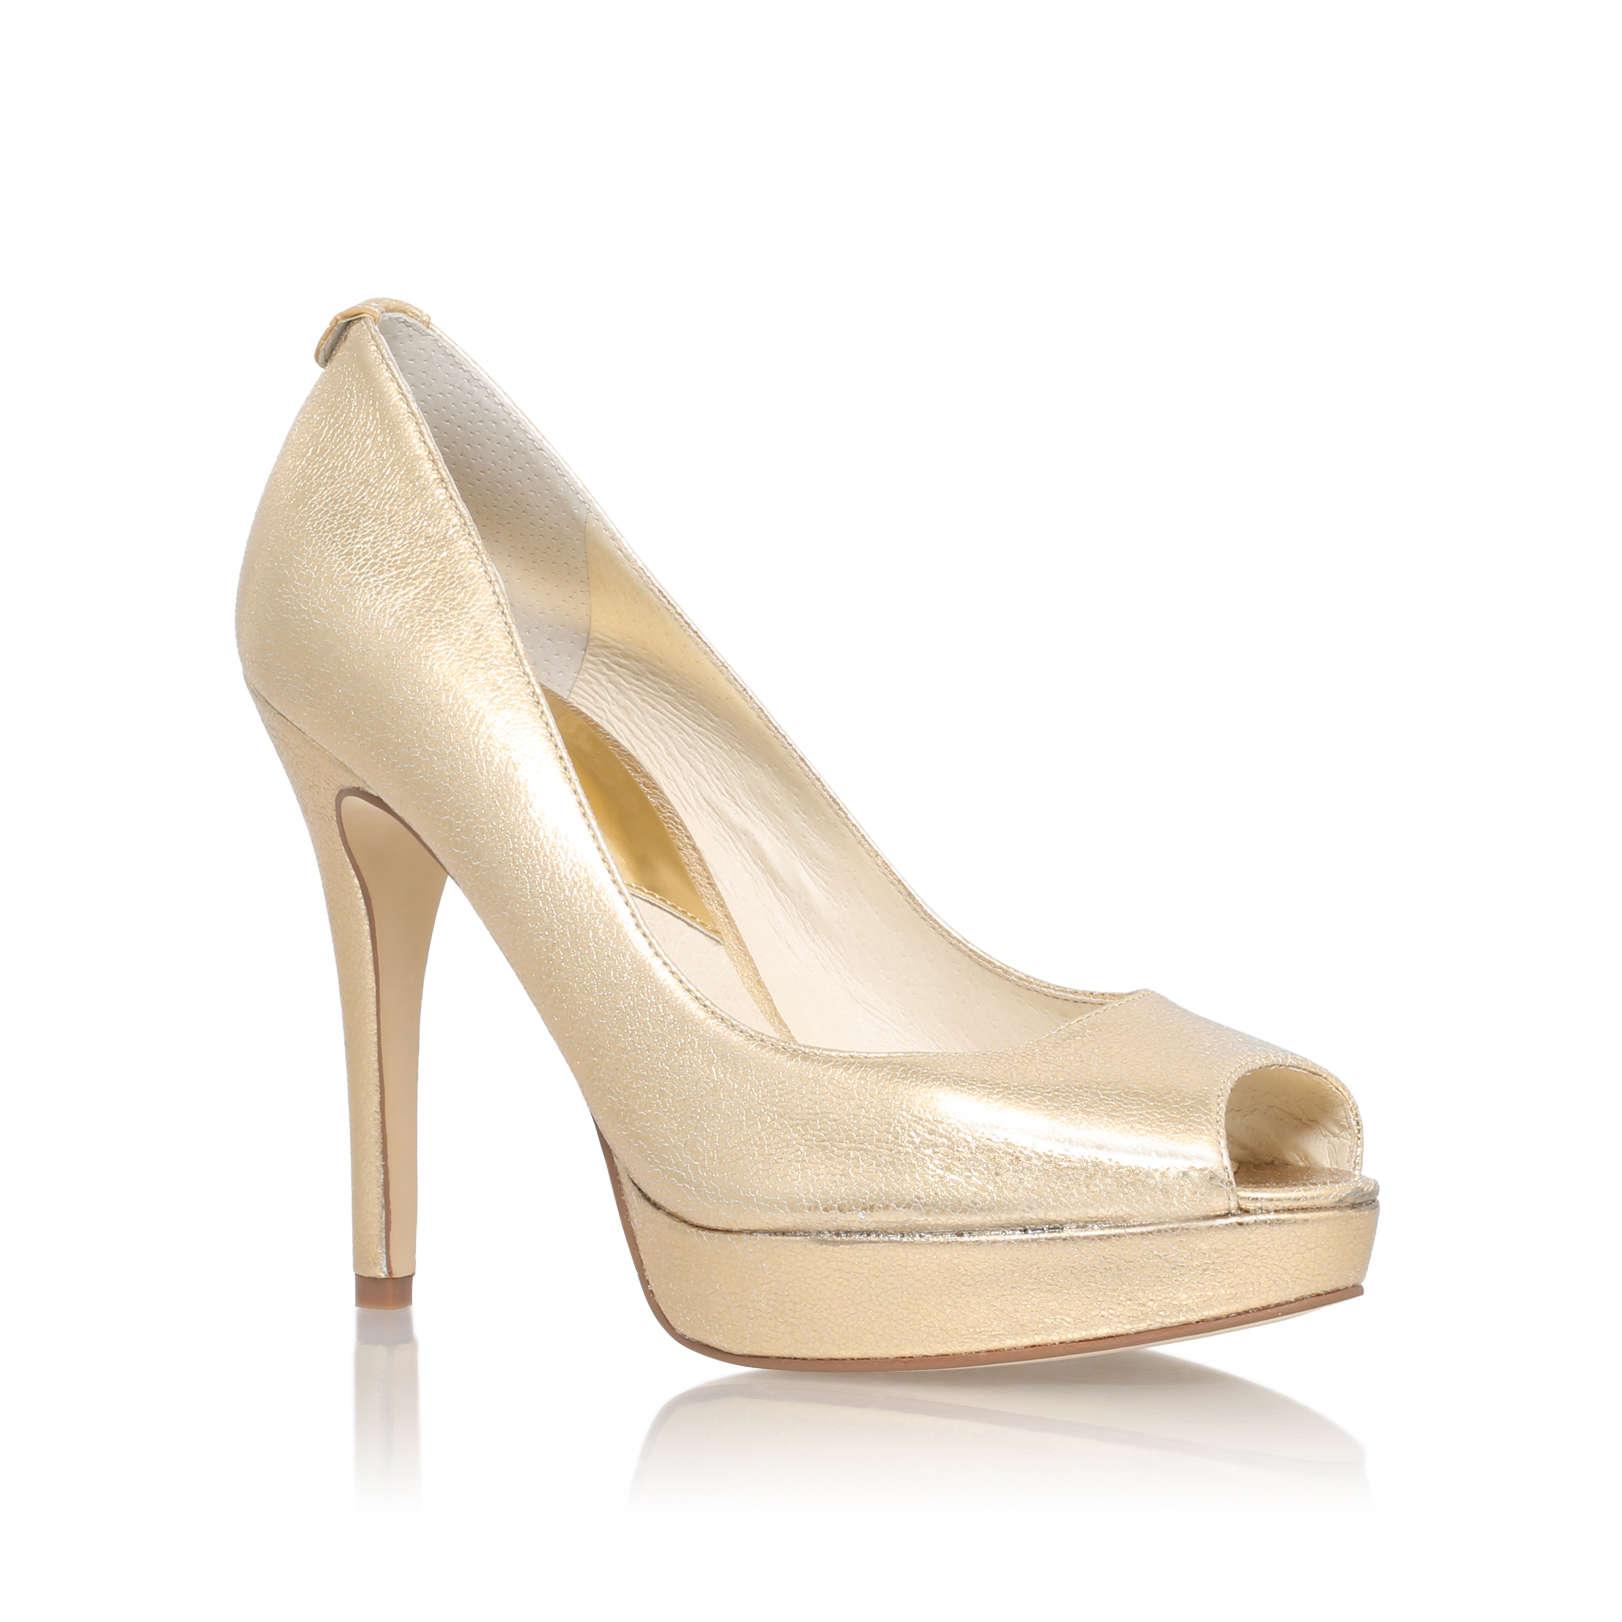 york platform michael michael kors york gold high heel court shoe by michael michael kors. Black Bedroom Furniture Sets. Home Design Ideas